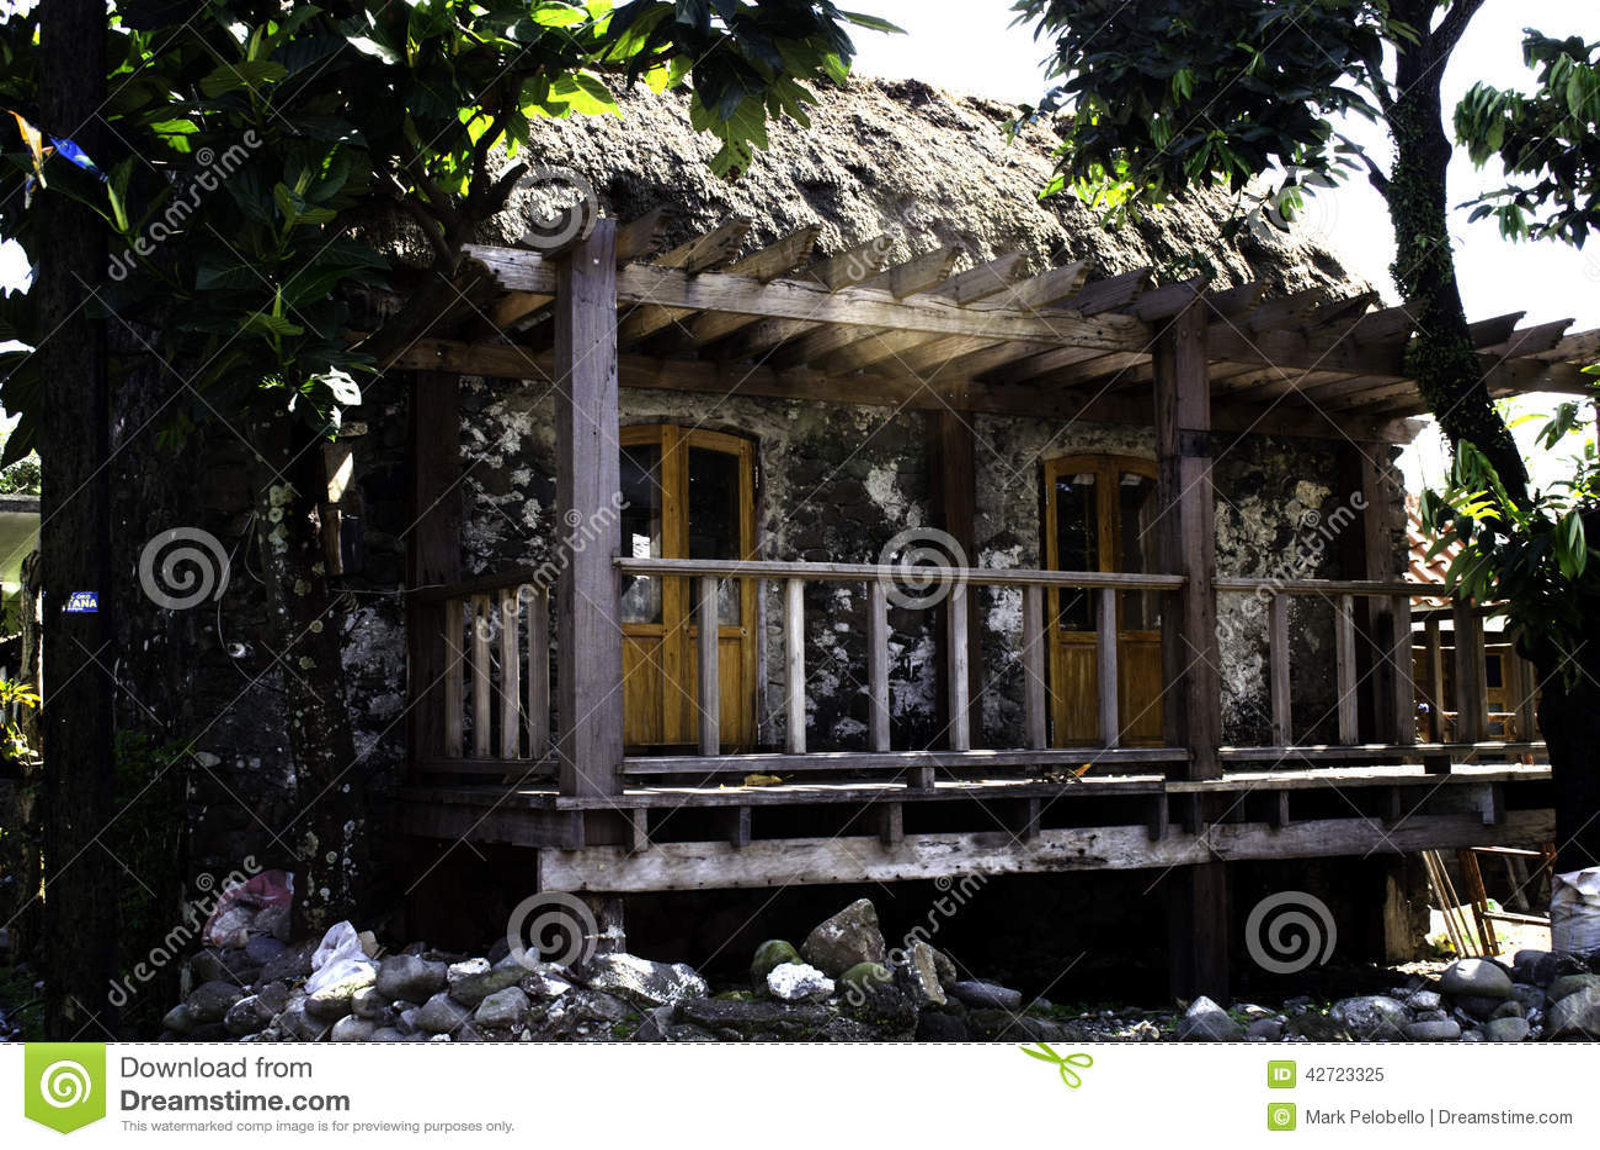 Ivatan House Ruins Batanes Philippines Stock Image - Image of world